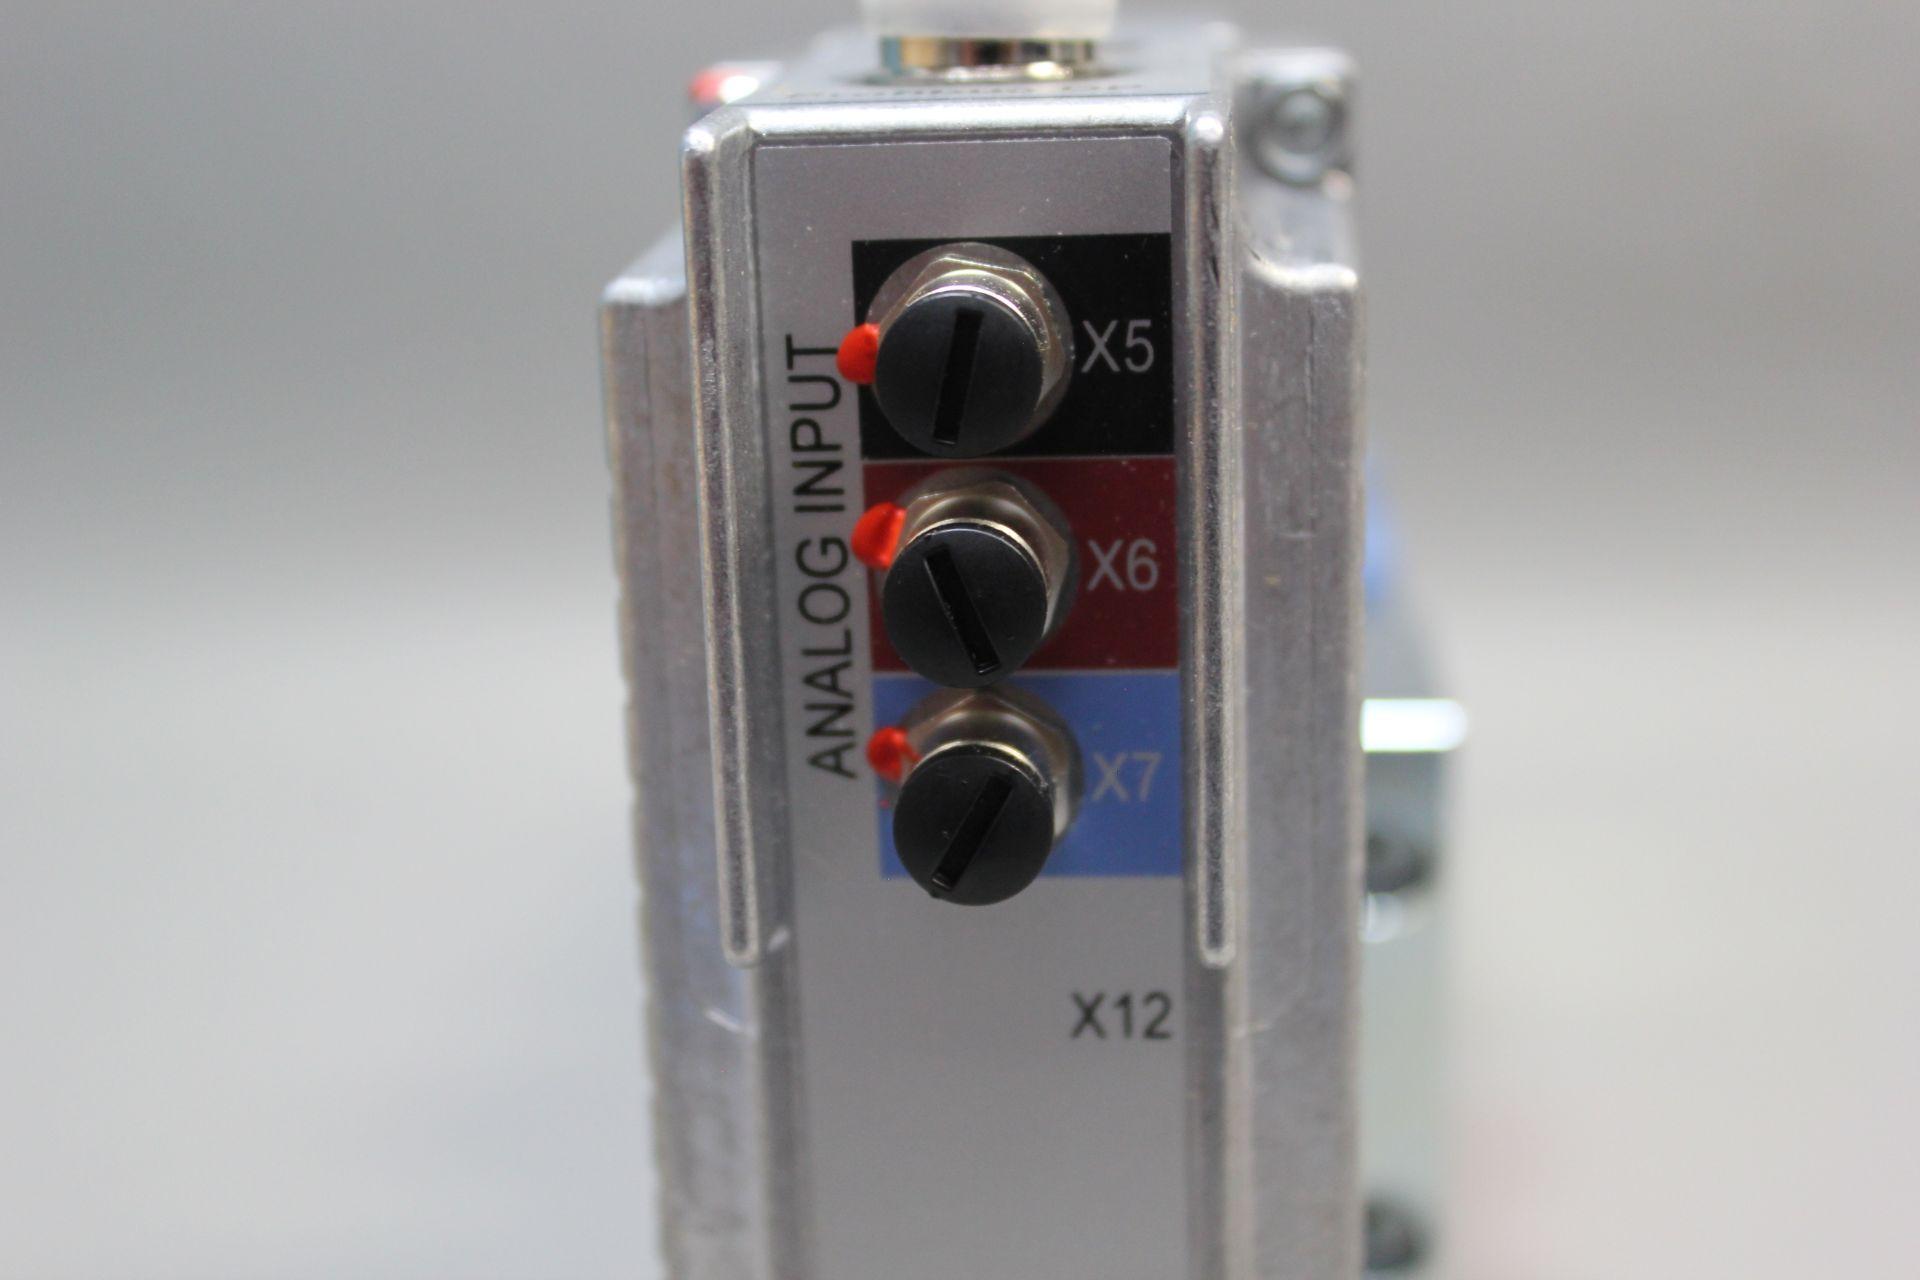 NEW MOOG DIRECT DRIVE DIGITAL CONTROL HYDRAULIC SERVO VALVE - Image 10 of 15